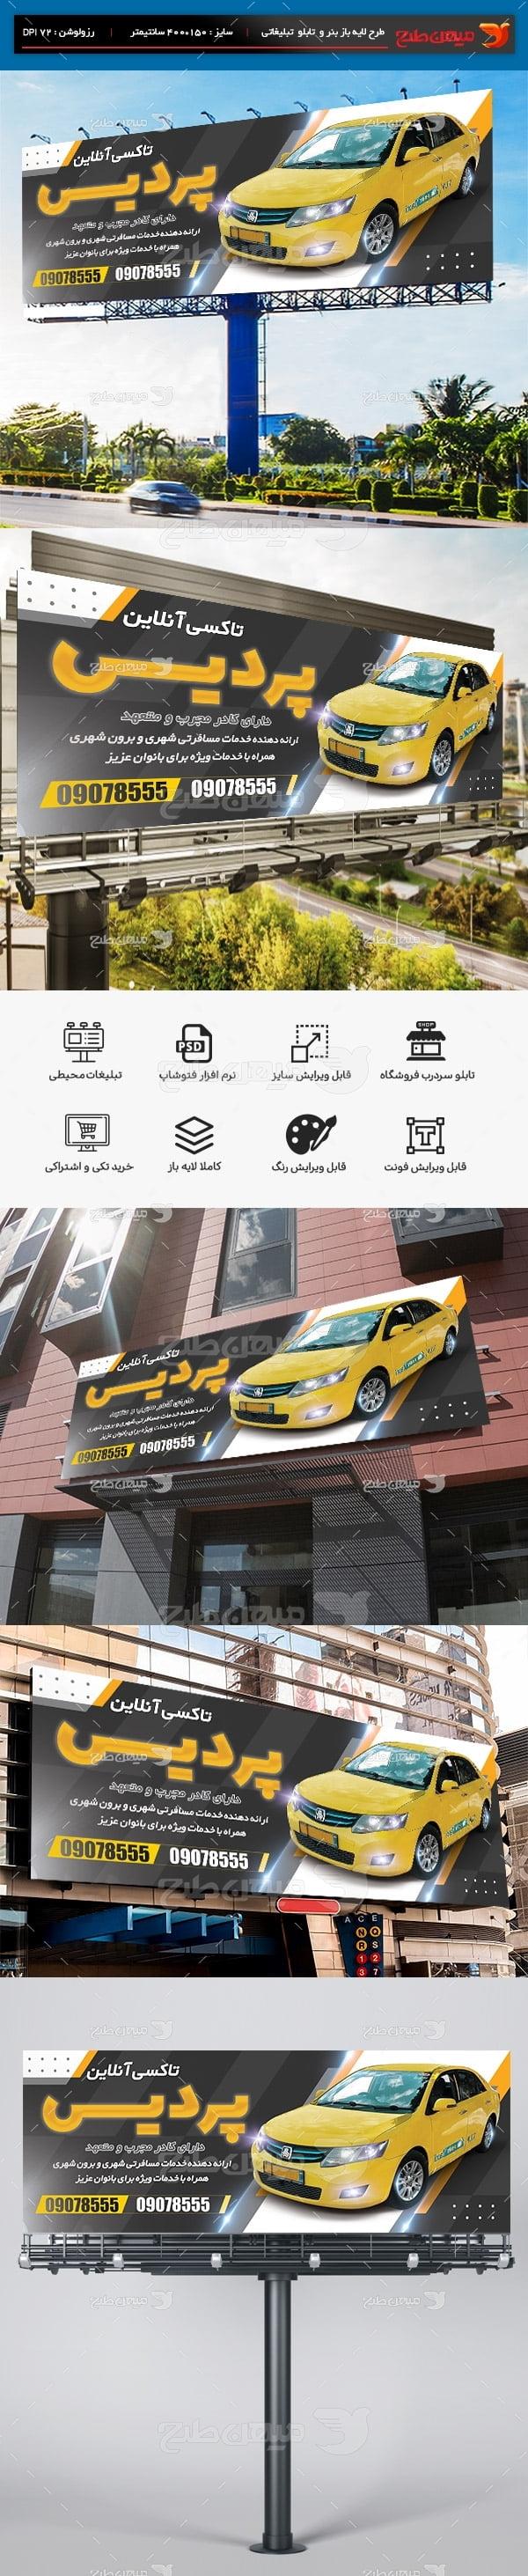 طرح لایه باز بنر تابلو تاکسی سرویس